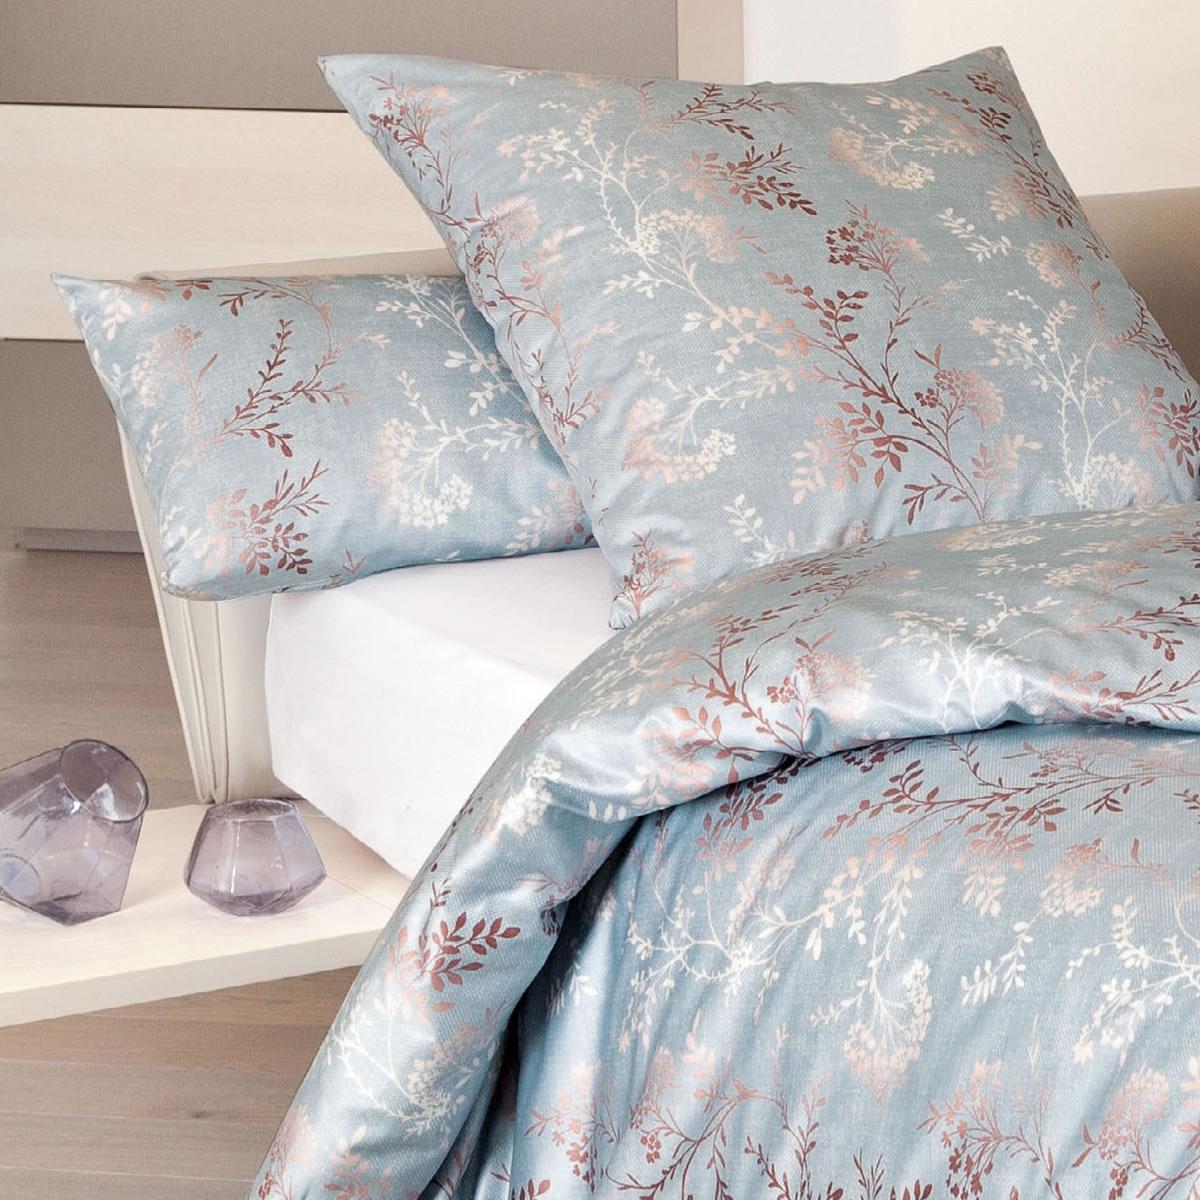 janine interlock fein jersey bettw sche carmen 53039 08 nebelmeer henna grau ebay. Black Bedroom Furniture Sets. Home Design Ideas